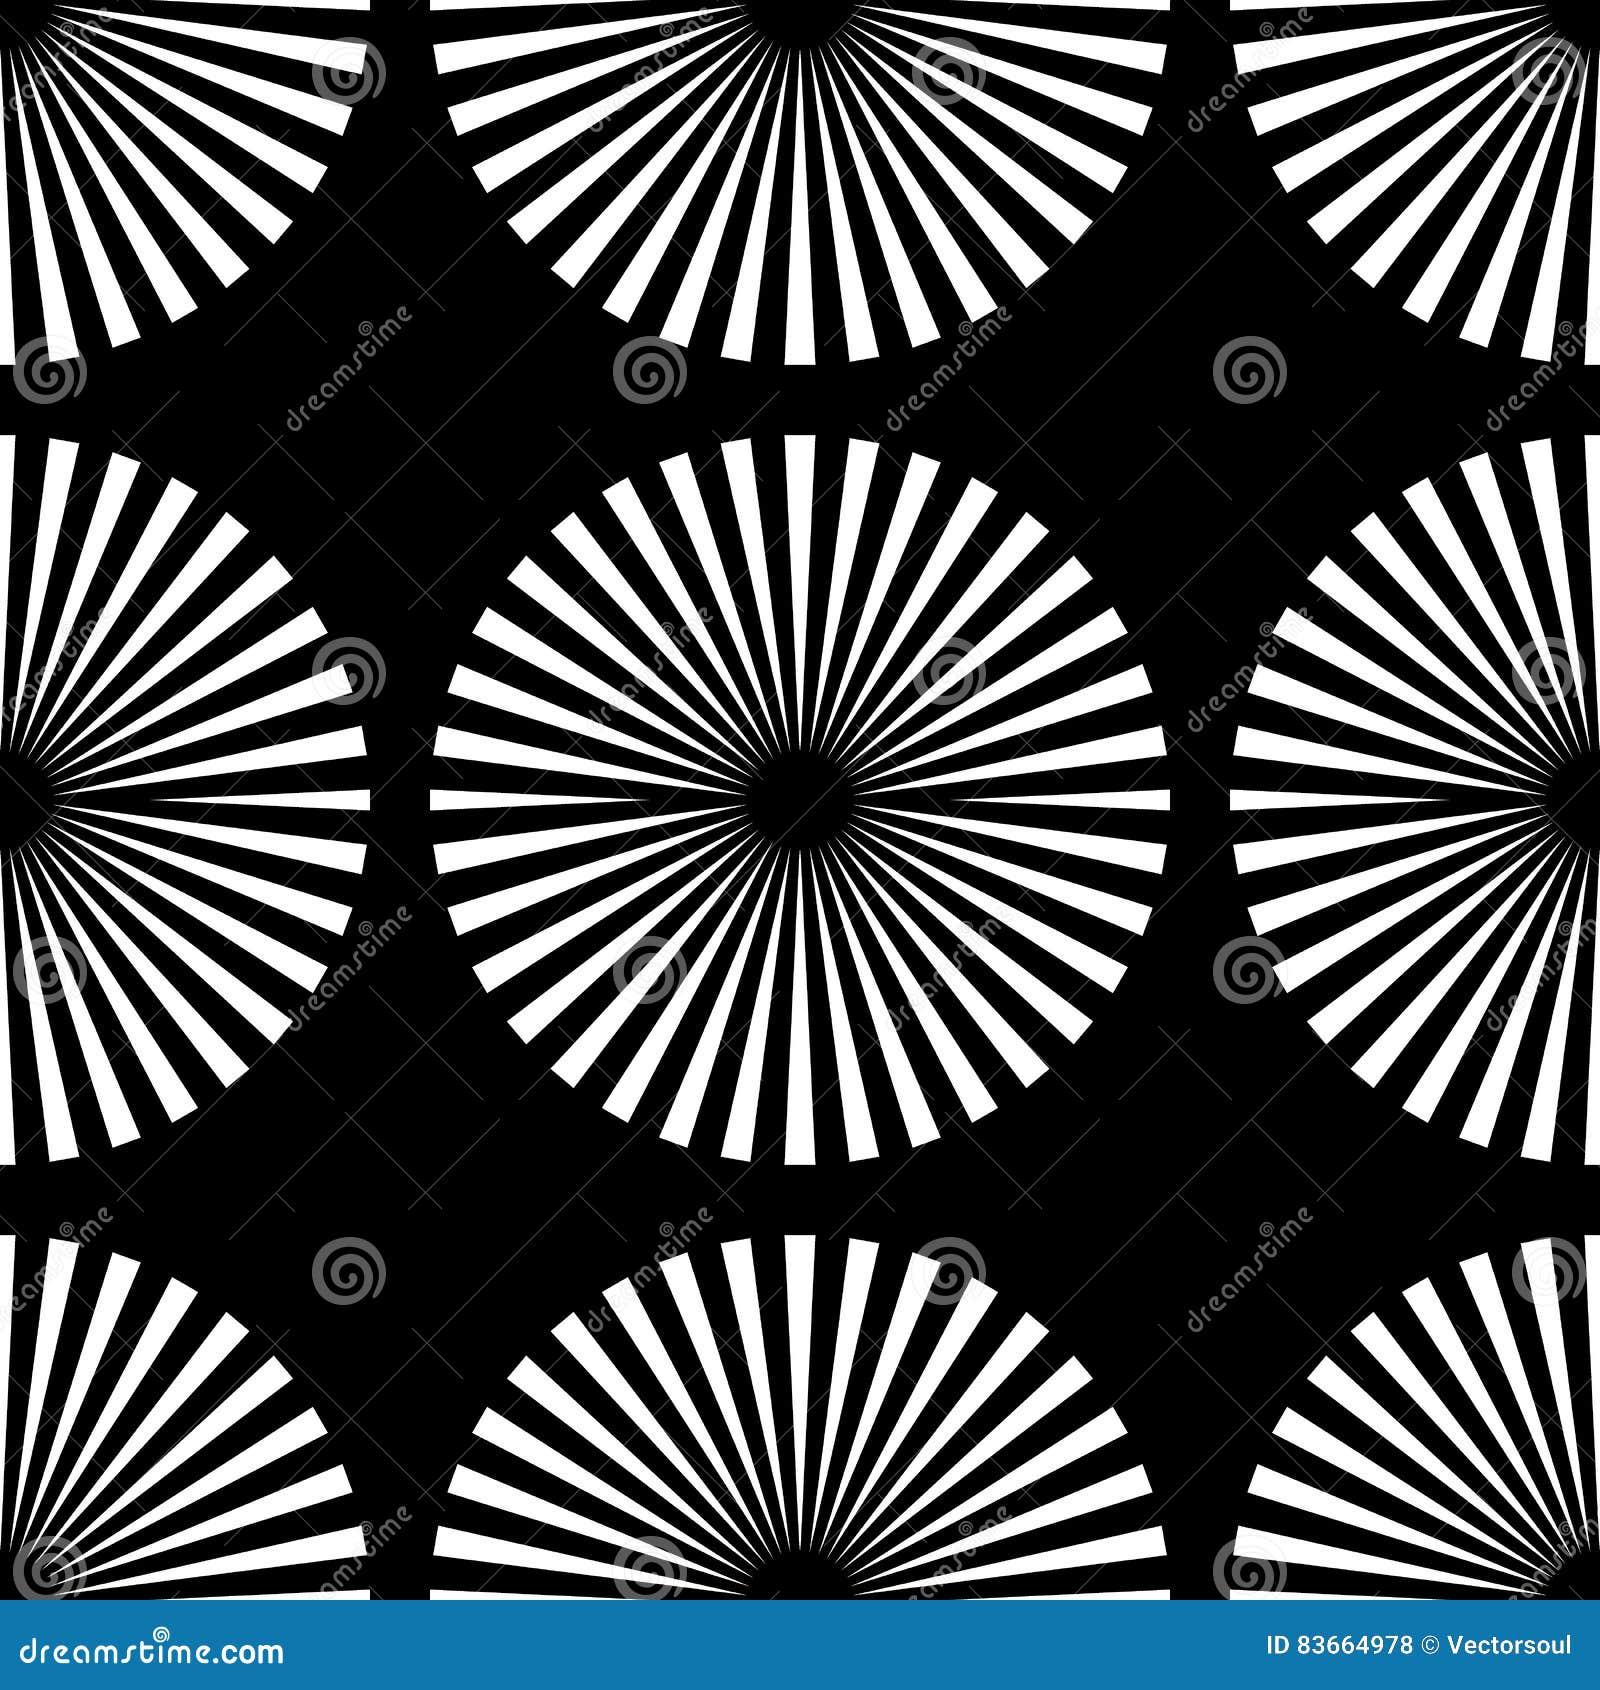 starburst rays beams seamless geometric pattern monochrome r stock I-Beam Machined starburst rays beams seamless geometric pattern monochrome r